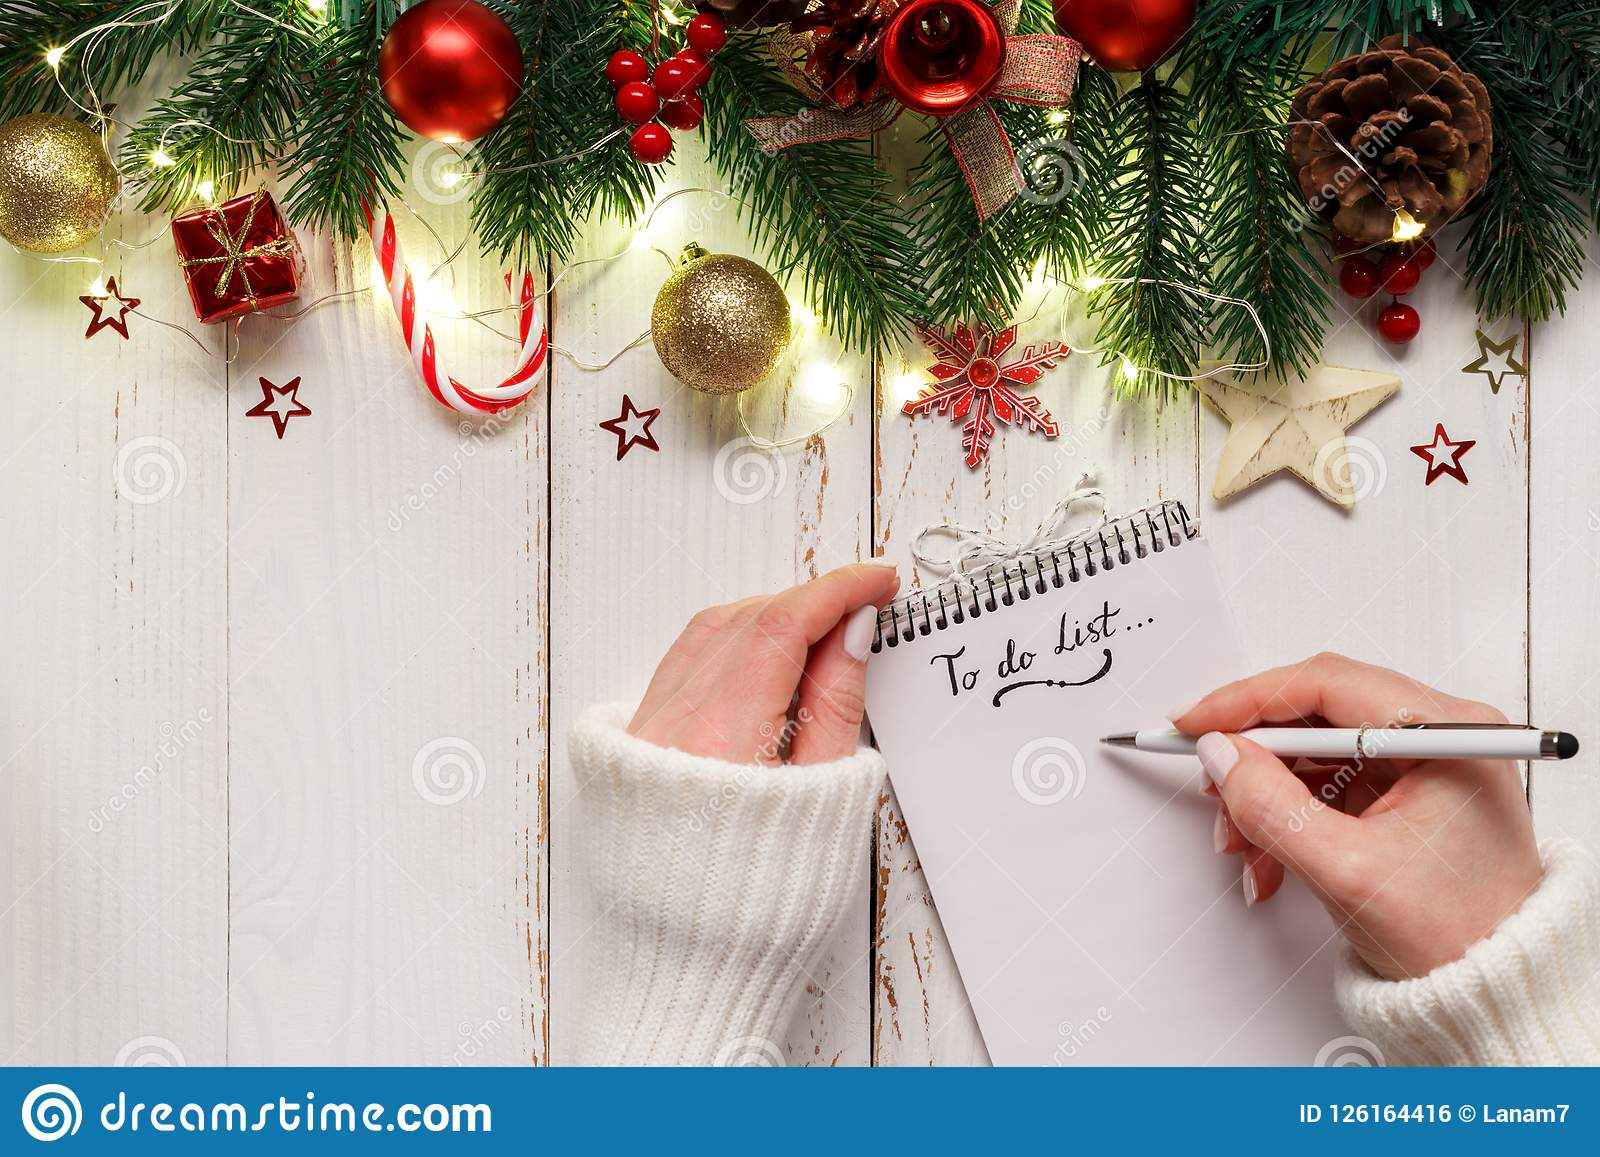 wish list ideas